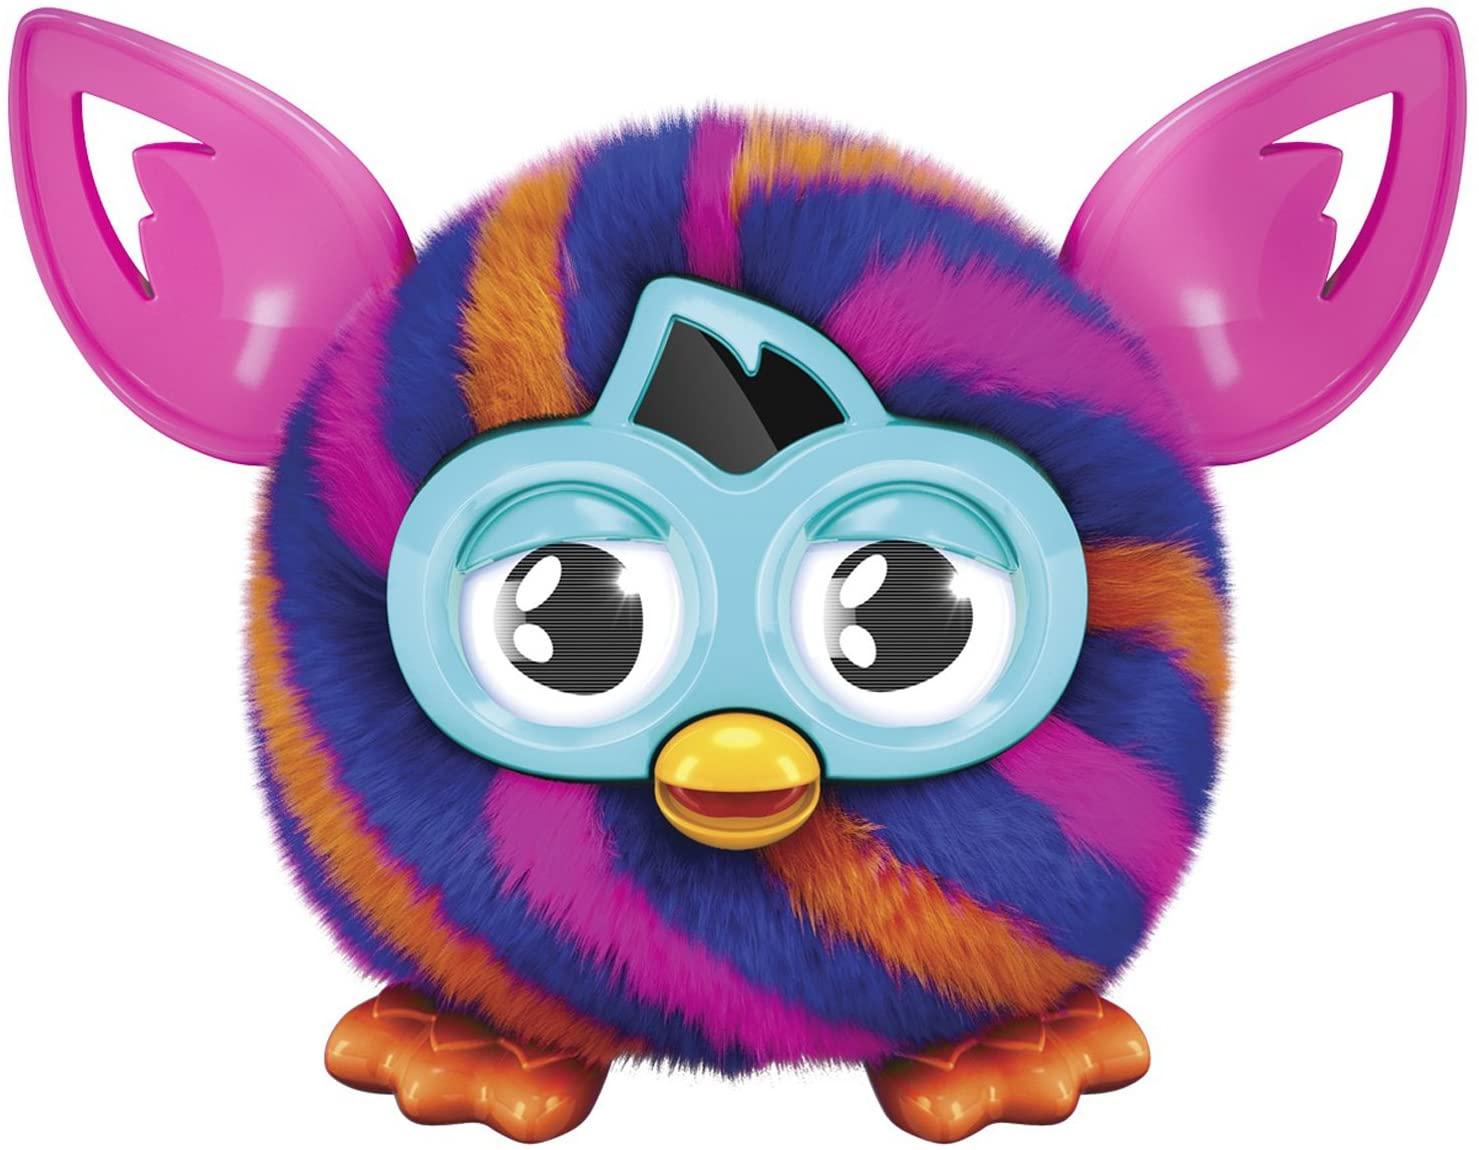 Furby Furbling Critter (Orange and Blue Diagonal Stripes)